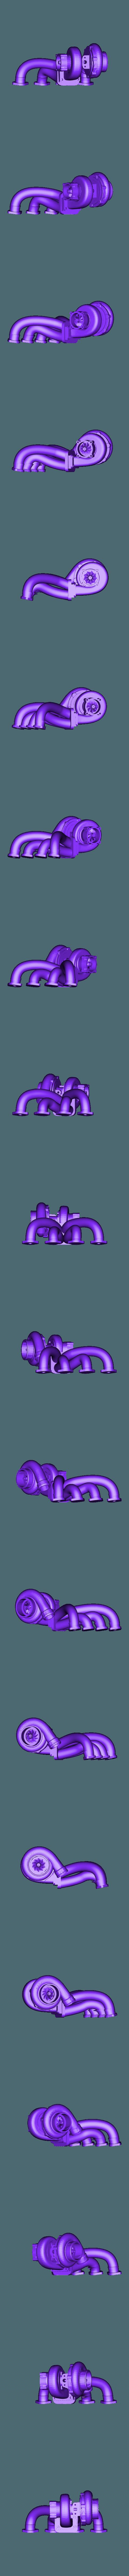 collecteur turbo.stl Download STL file Fury road hotrod bodyshell 1/10 • 3D printing design, RCGANG93